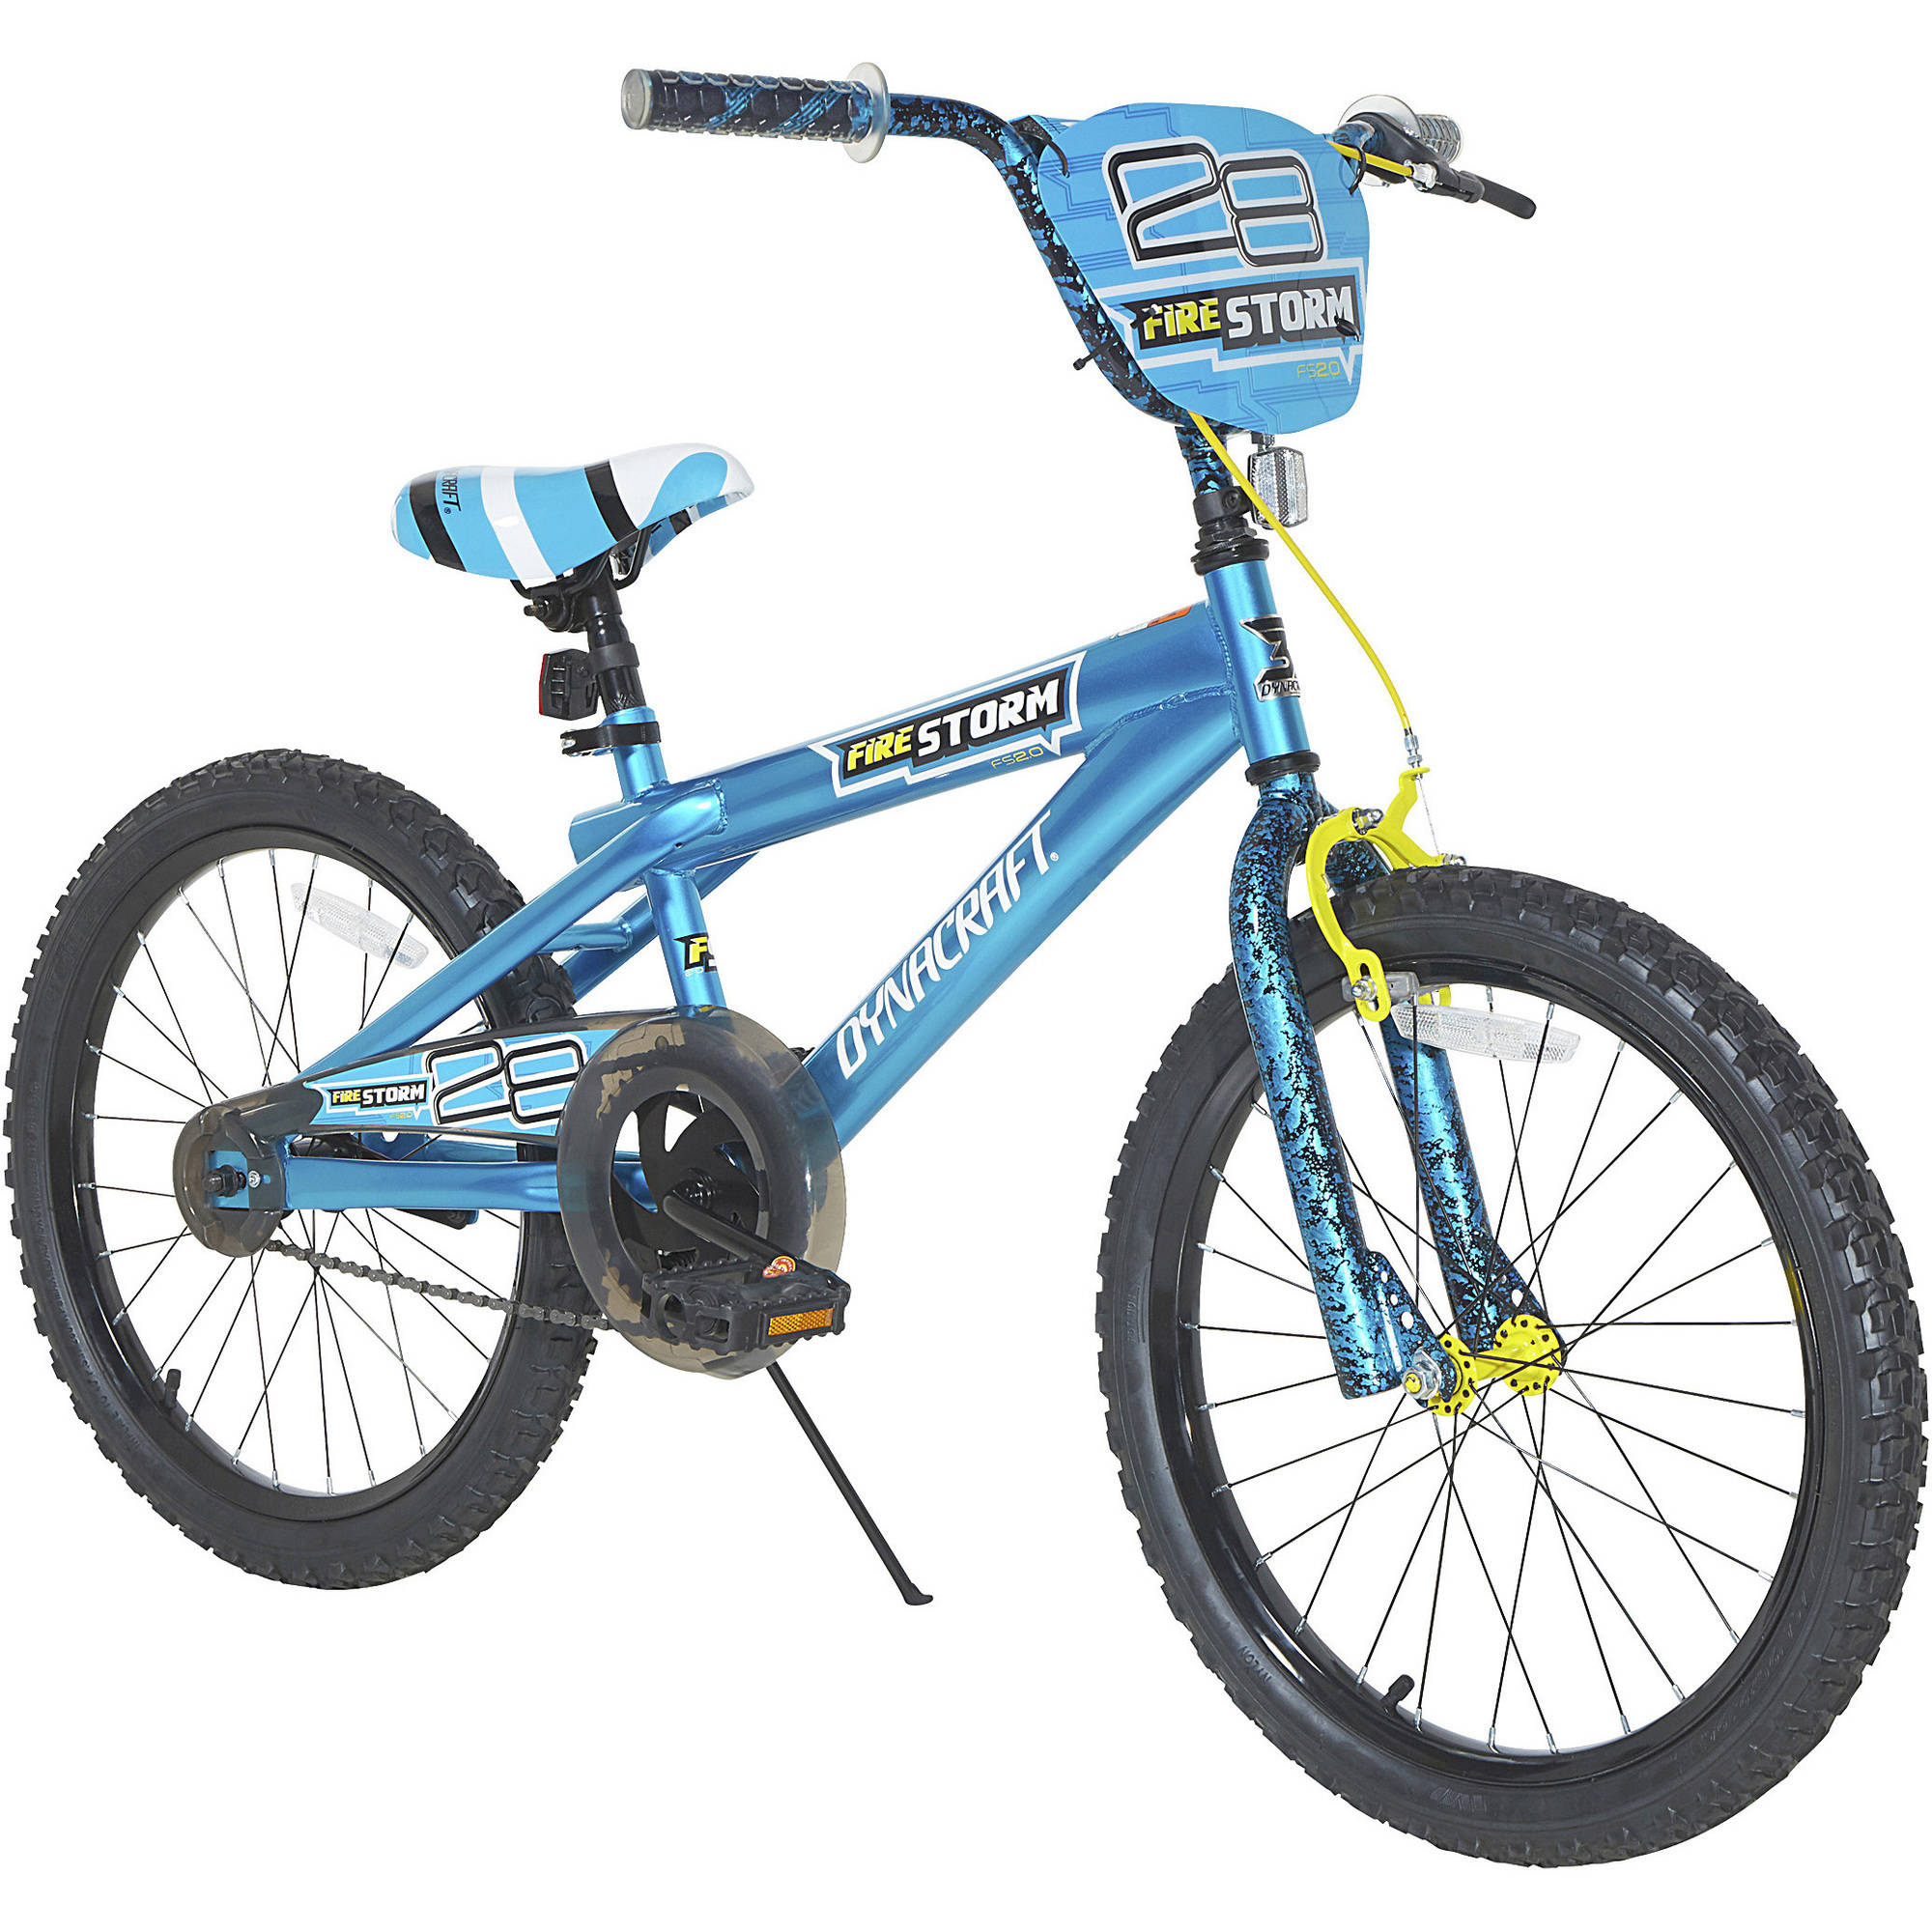 "Dynacraft 20"" Boys' Firestorm Bike"